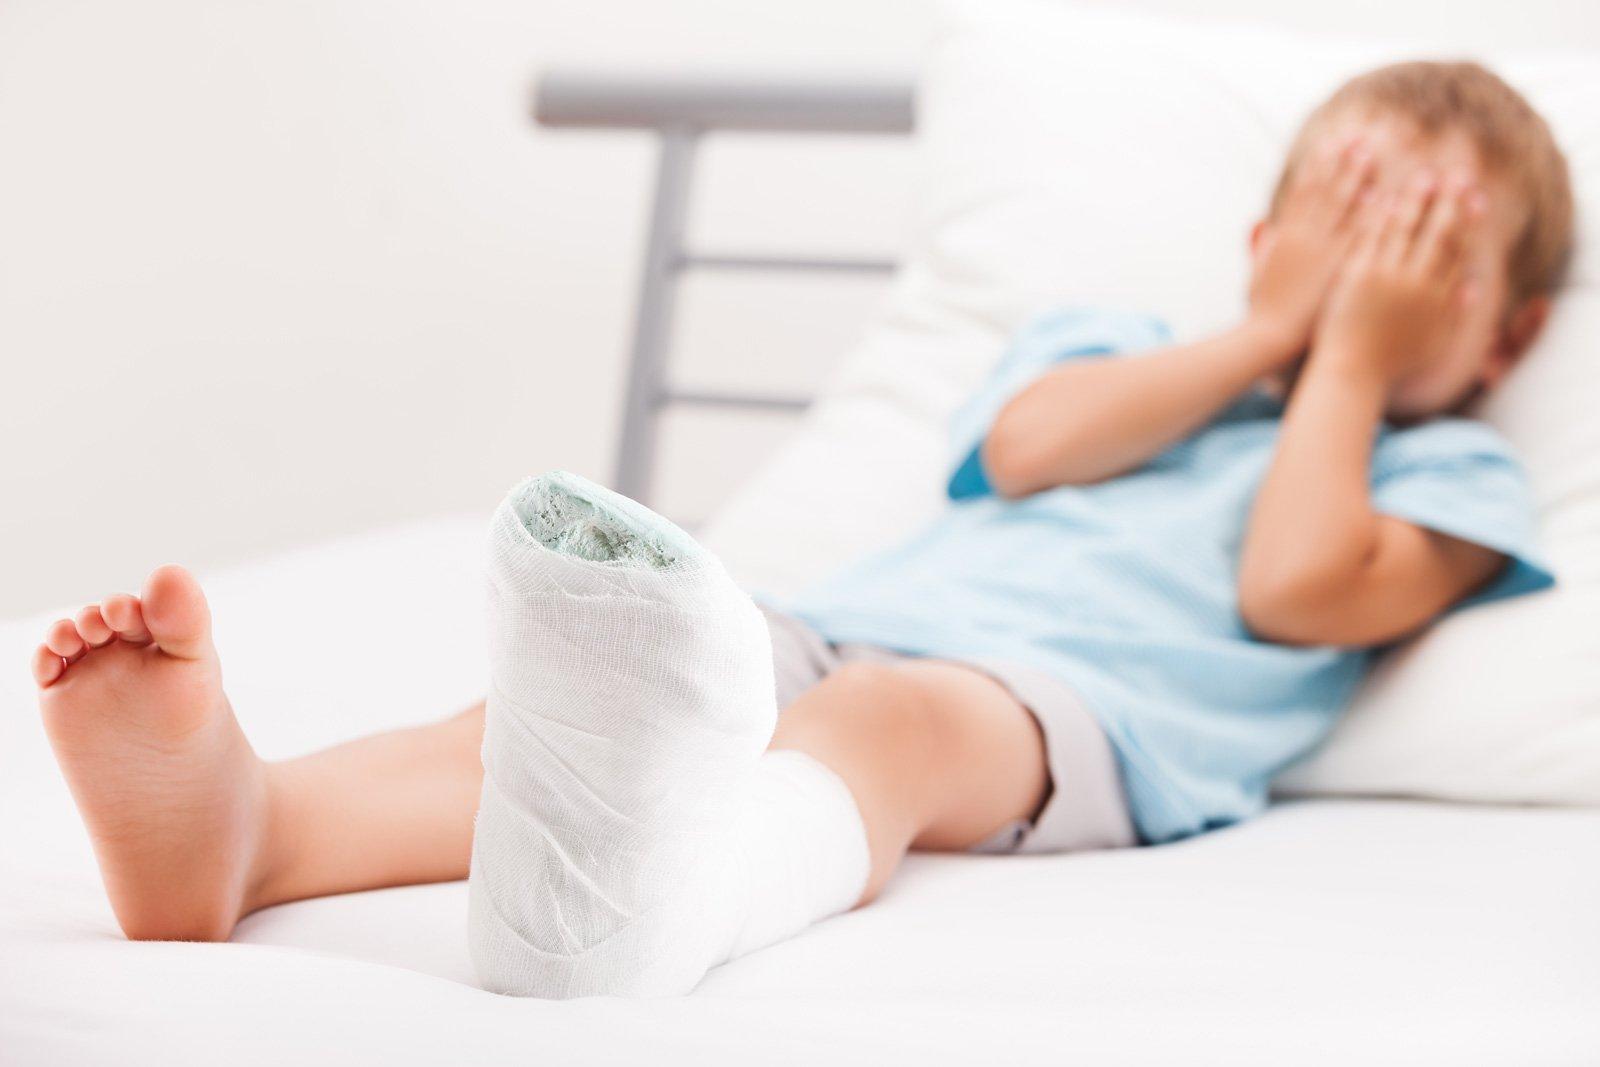 child-injury-wilmington-de